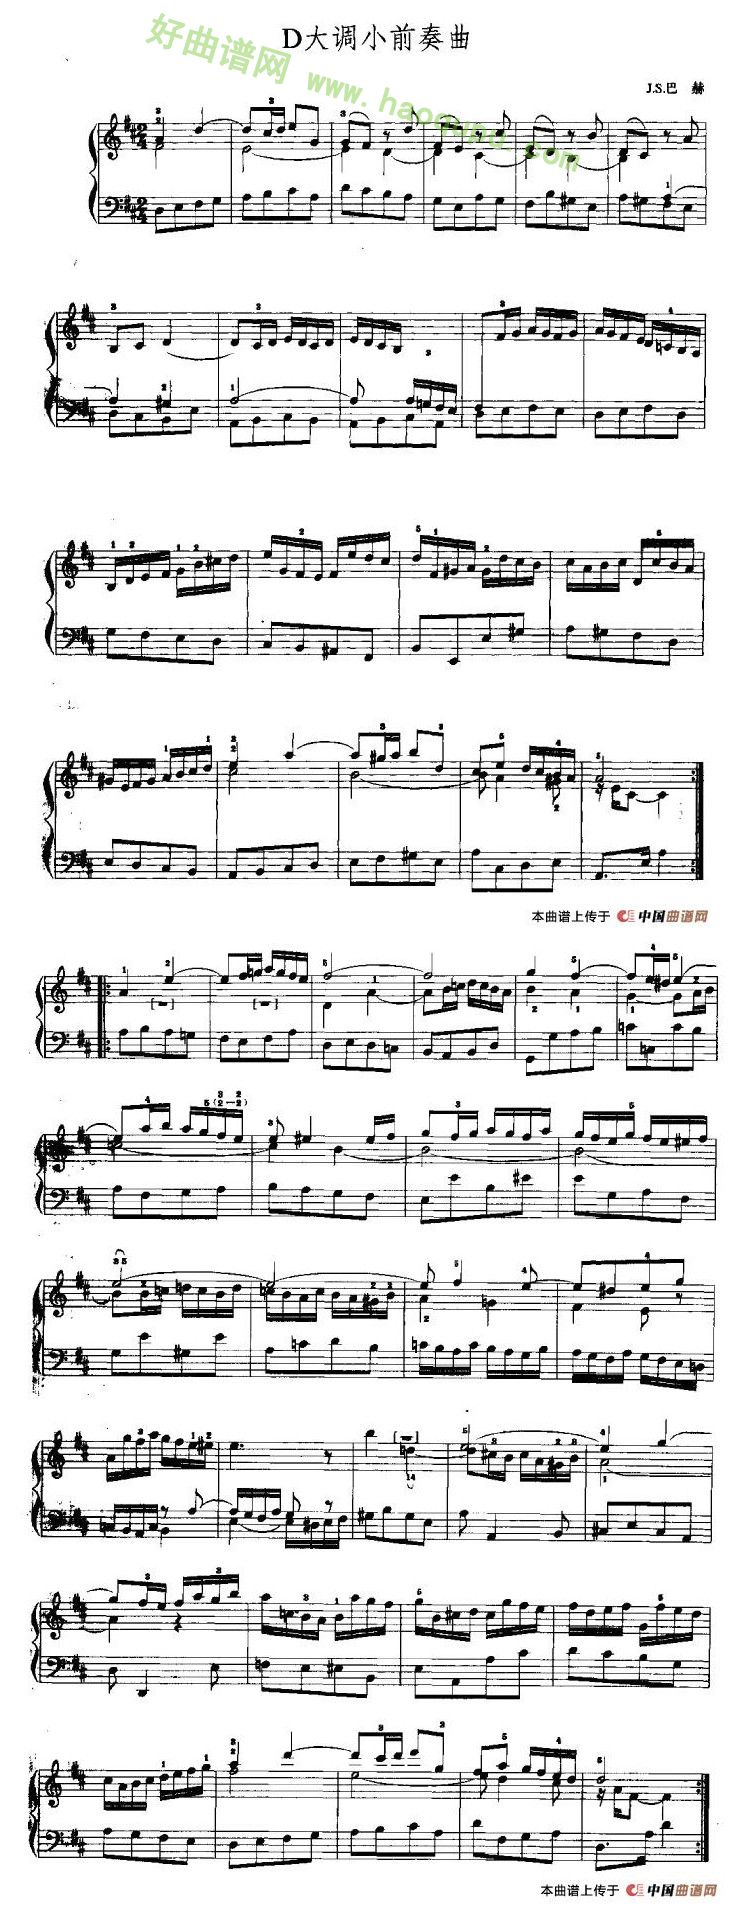 《d大调小前奏曲》 - 手风琴曲谱